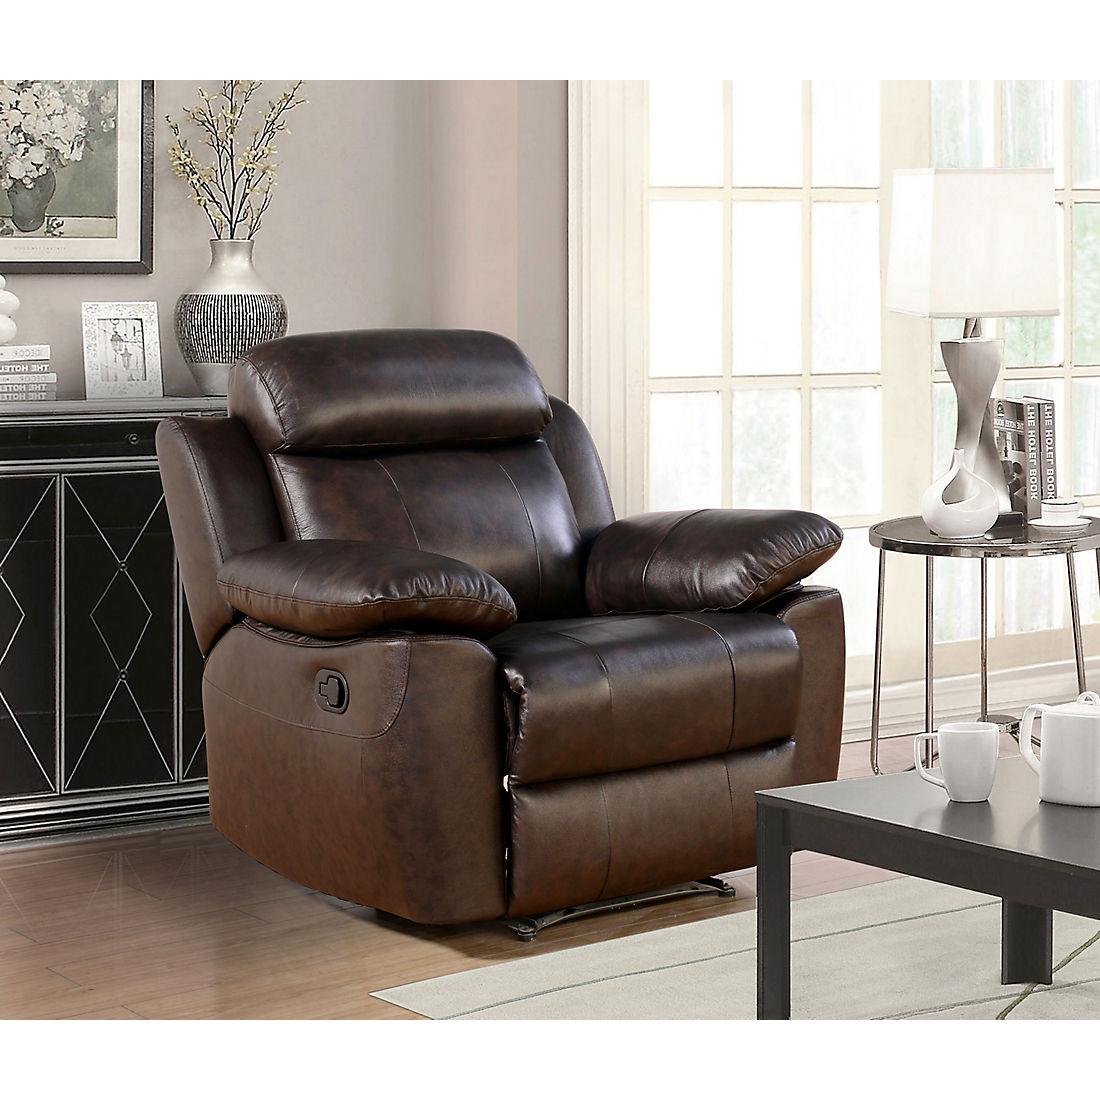 Groovy Abbyson Living Braylen Top Grain Leather Recliner Brown Ibusinesslaw Wood Chair Design Ideas Ibusinesslaworg